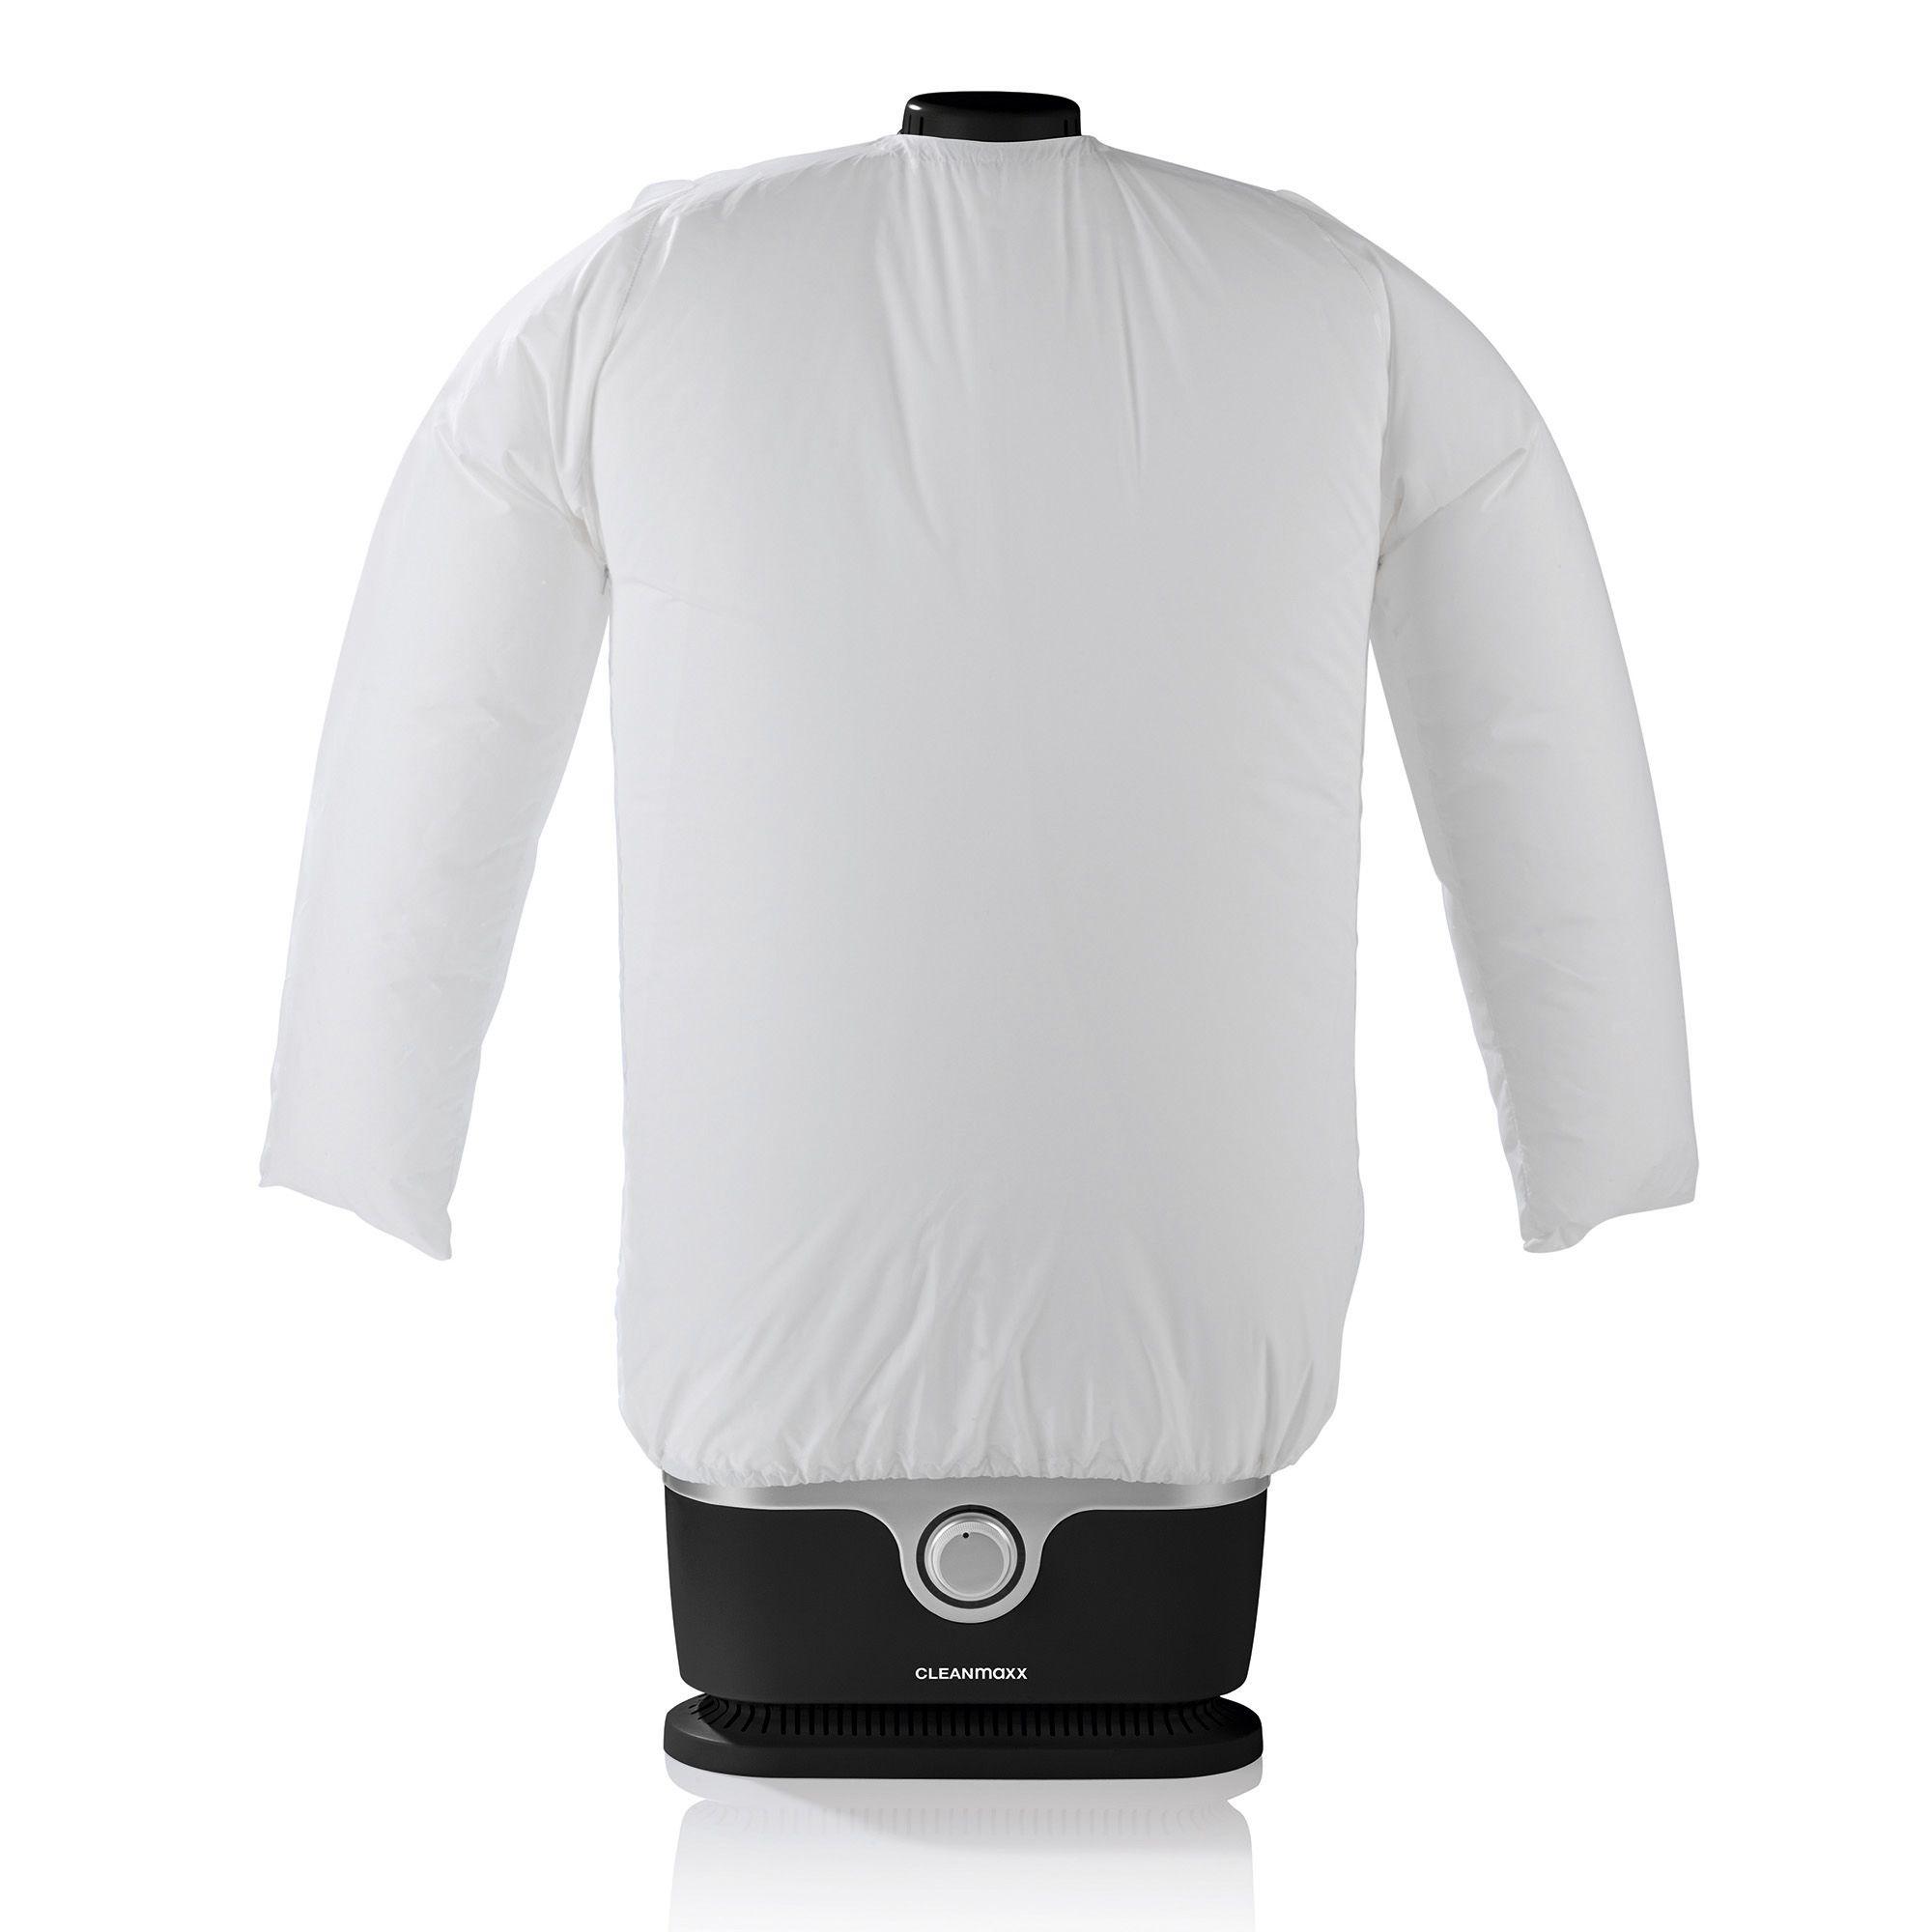 b8196b1edd2cc cleanmaxx® Hemden-   Blusenbügler vollautomatisch schonende Glättung - Page  1 — QVC.de